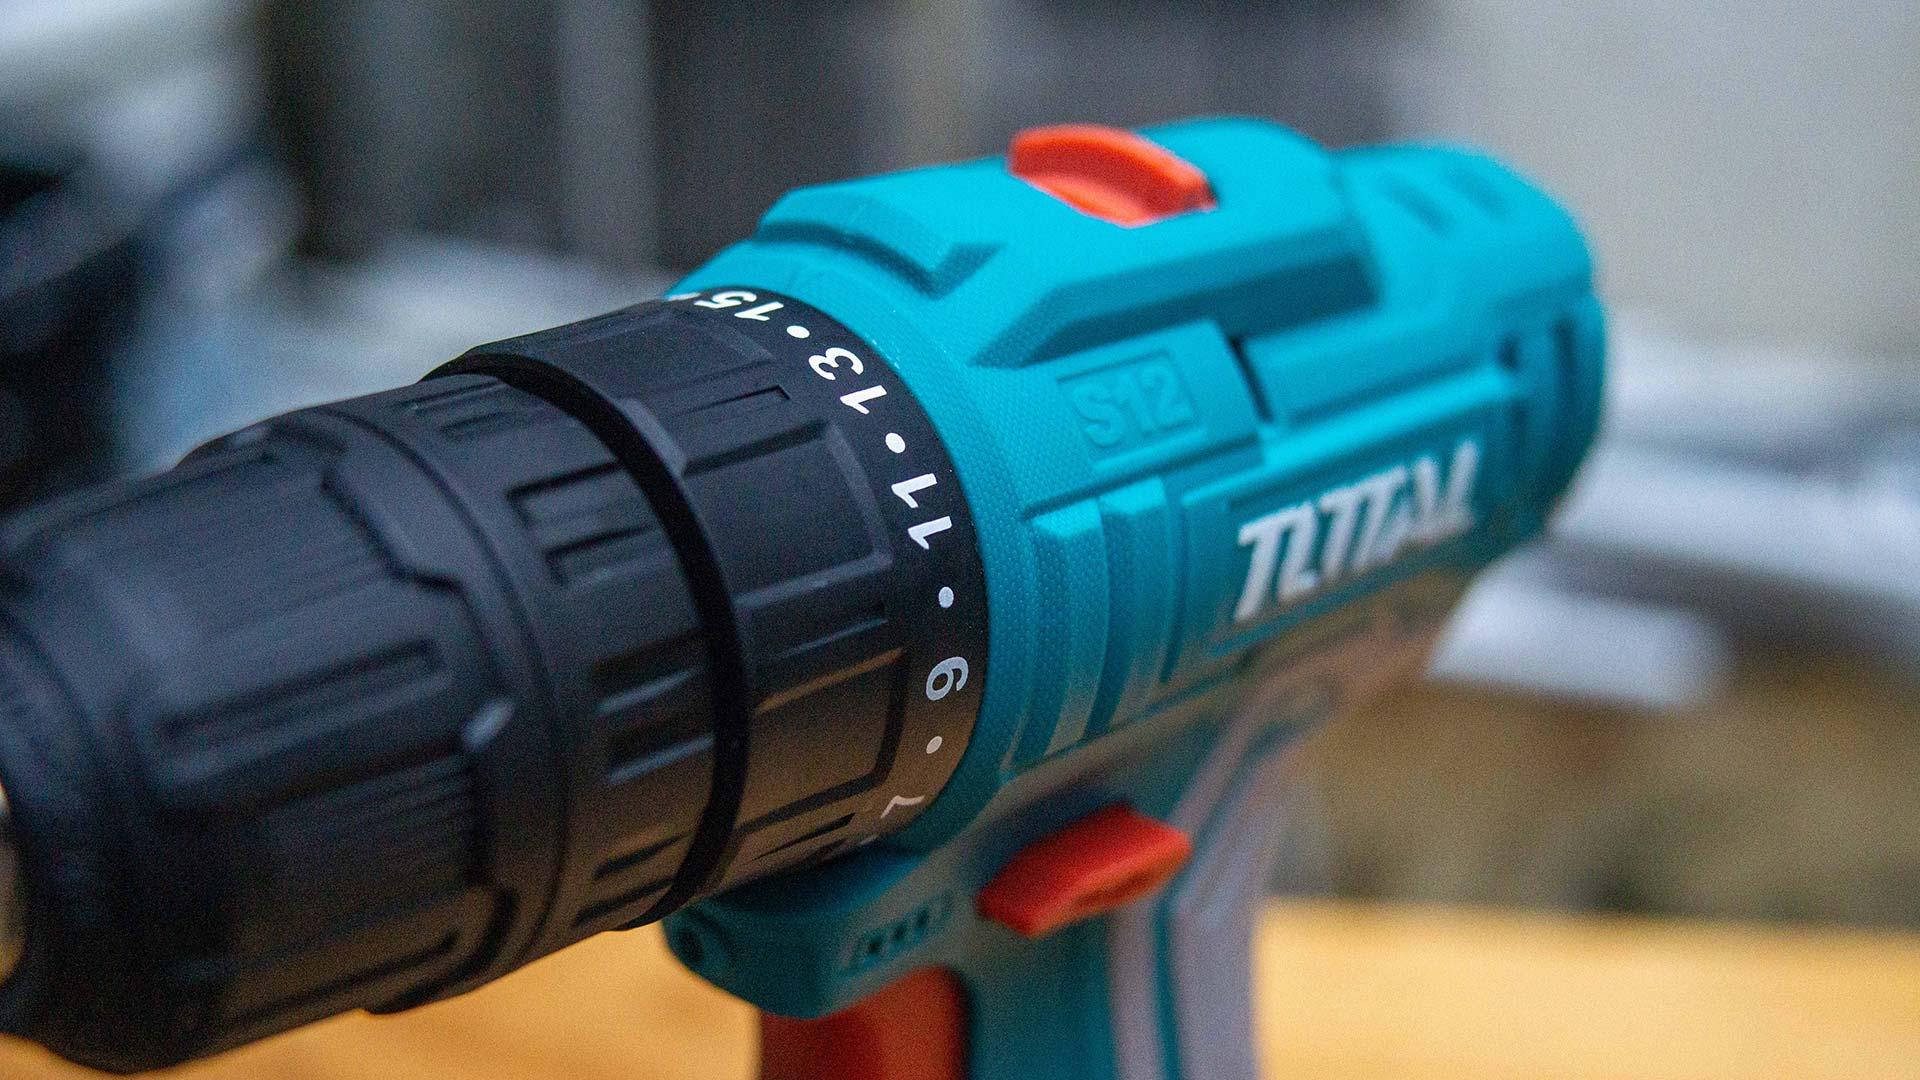 TDLI12325 photo shoot